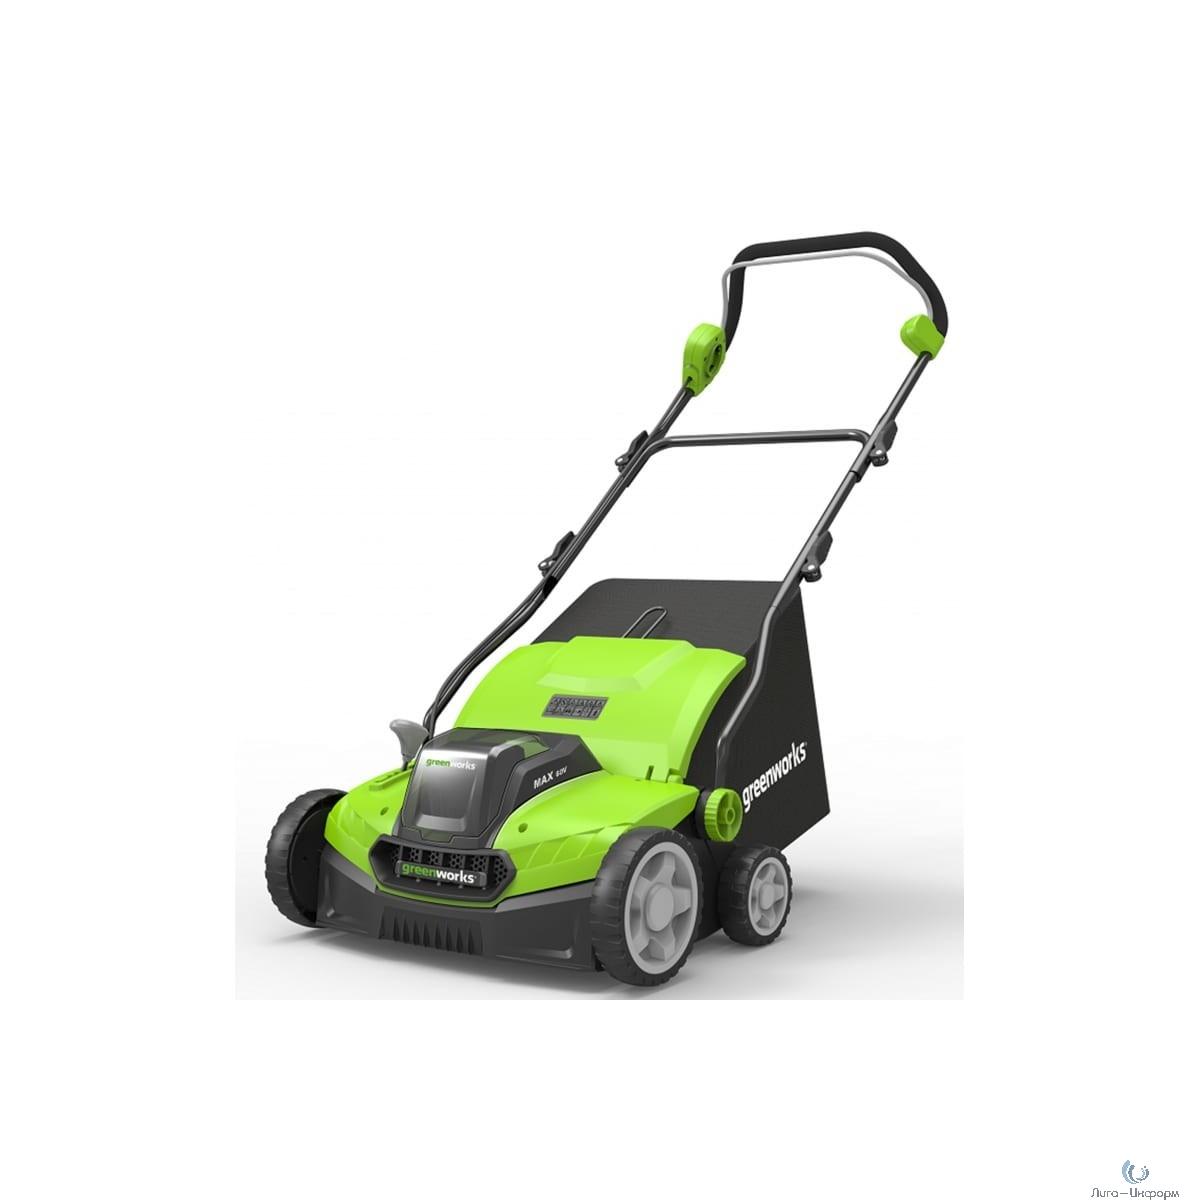 Greenworks Аэратор-скарификатор аккумуляторный Greenworks GD40SC36, 40V, бесщеточный, с АКБ 6АЧ и ЗУ [2511507UF]